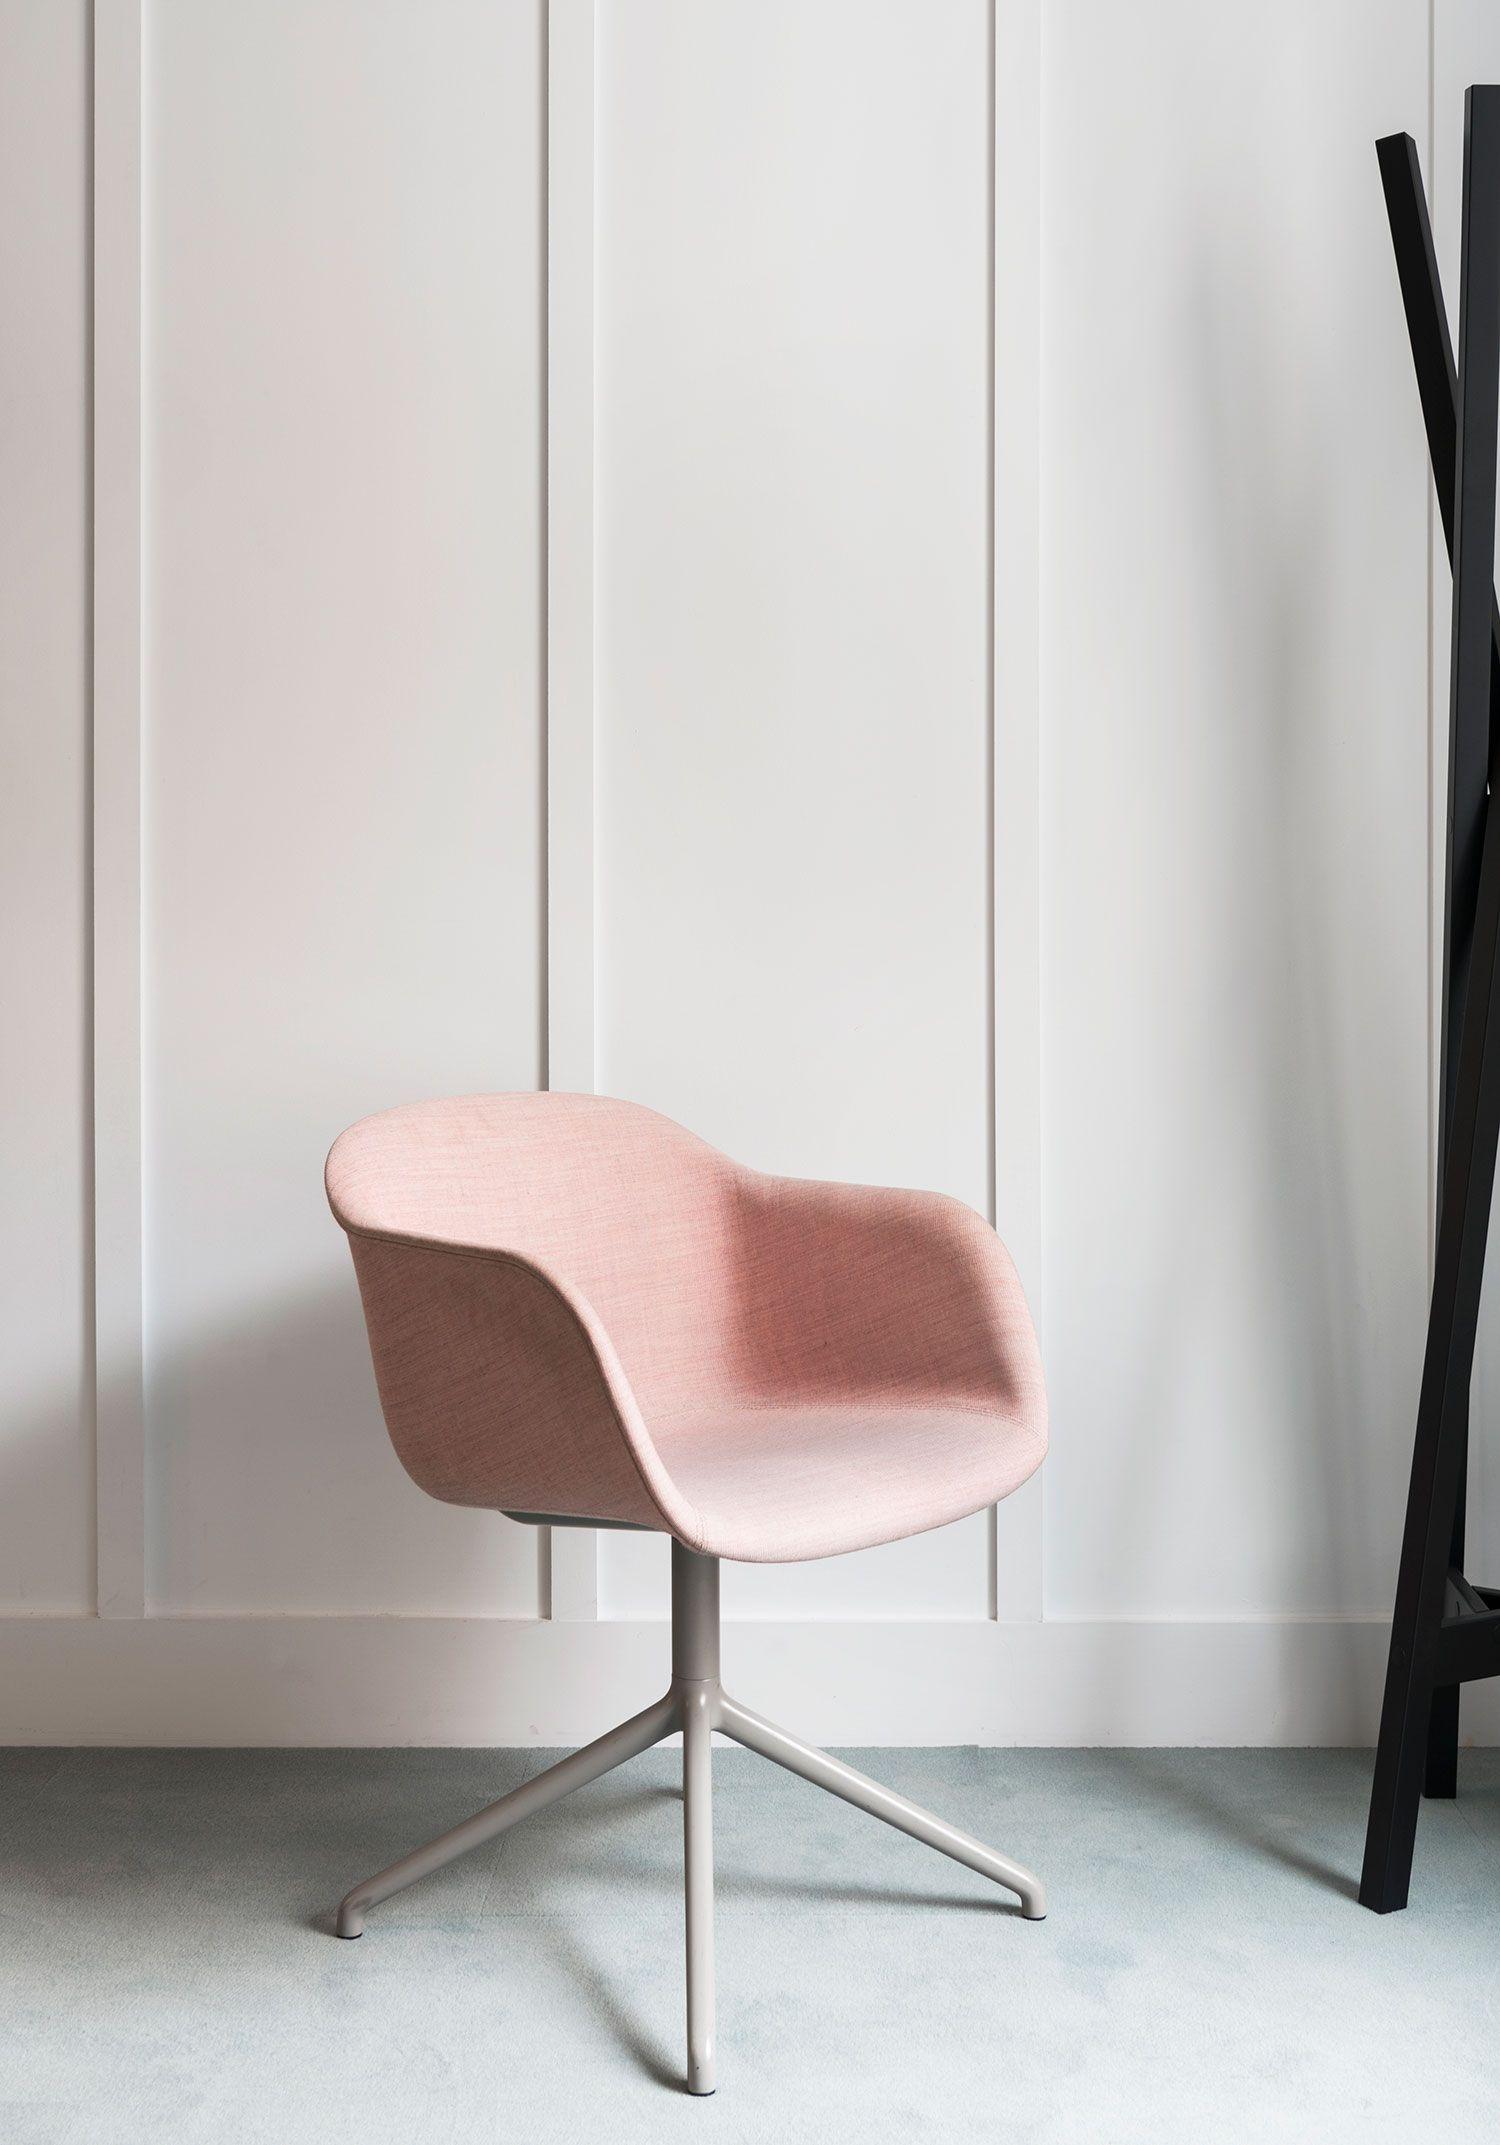 Elegant And Modern Office Chair Decor Inspiration From Muuto The Fiber Armchair Bri Scandinavian Furniture Design Modern Office Chair Dining Room Decor Modern